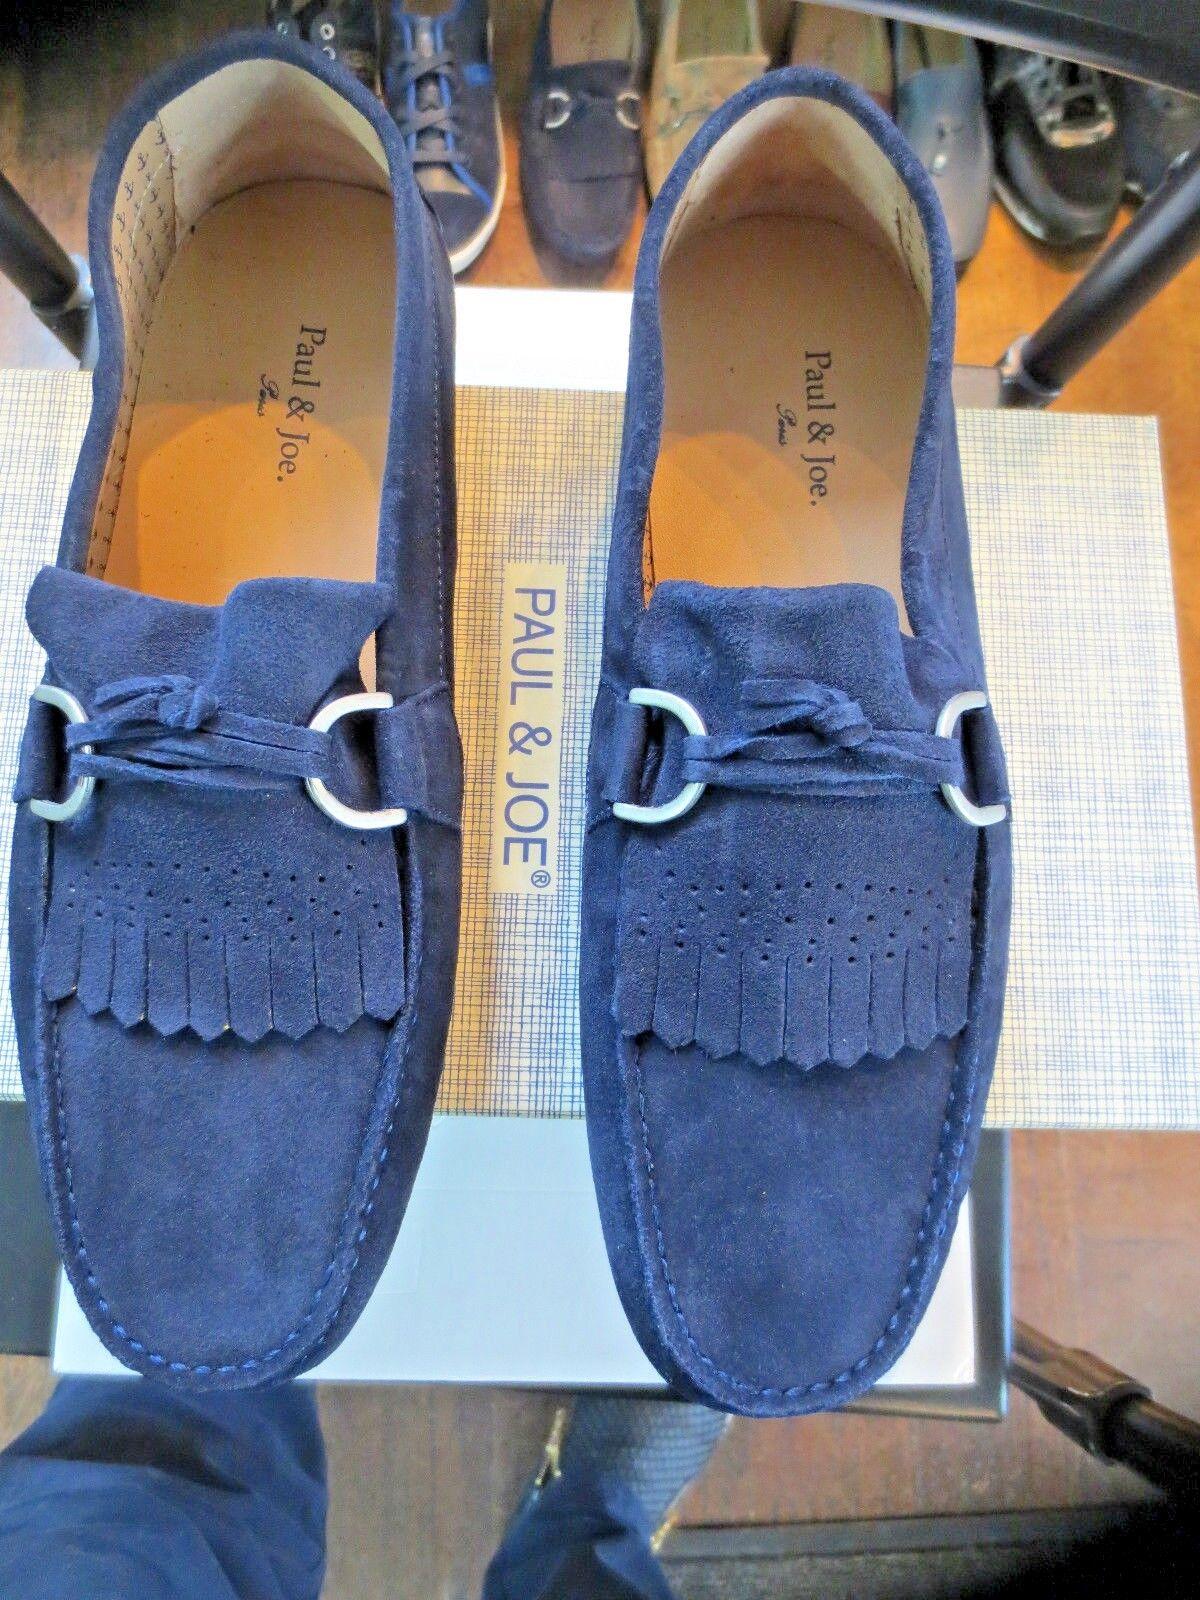 Paul Velours & Joe Carlton Ziege Velours Paul Marine neu Wert 159E Schuhgrößen 41,44 3c6f61